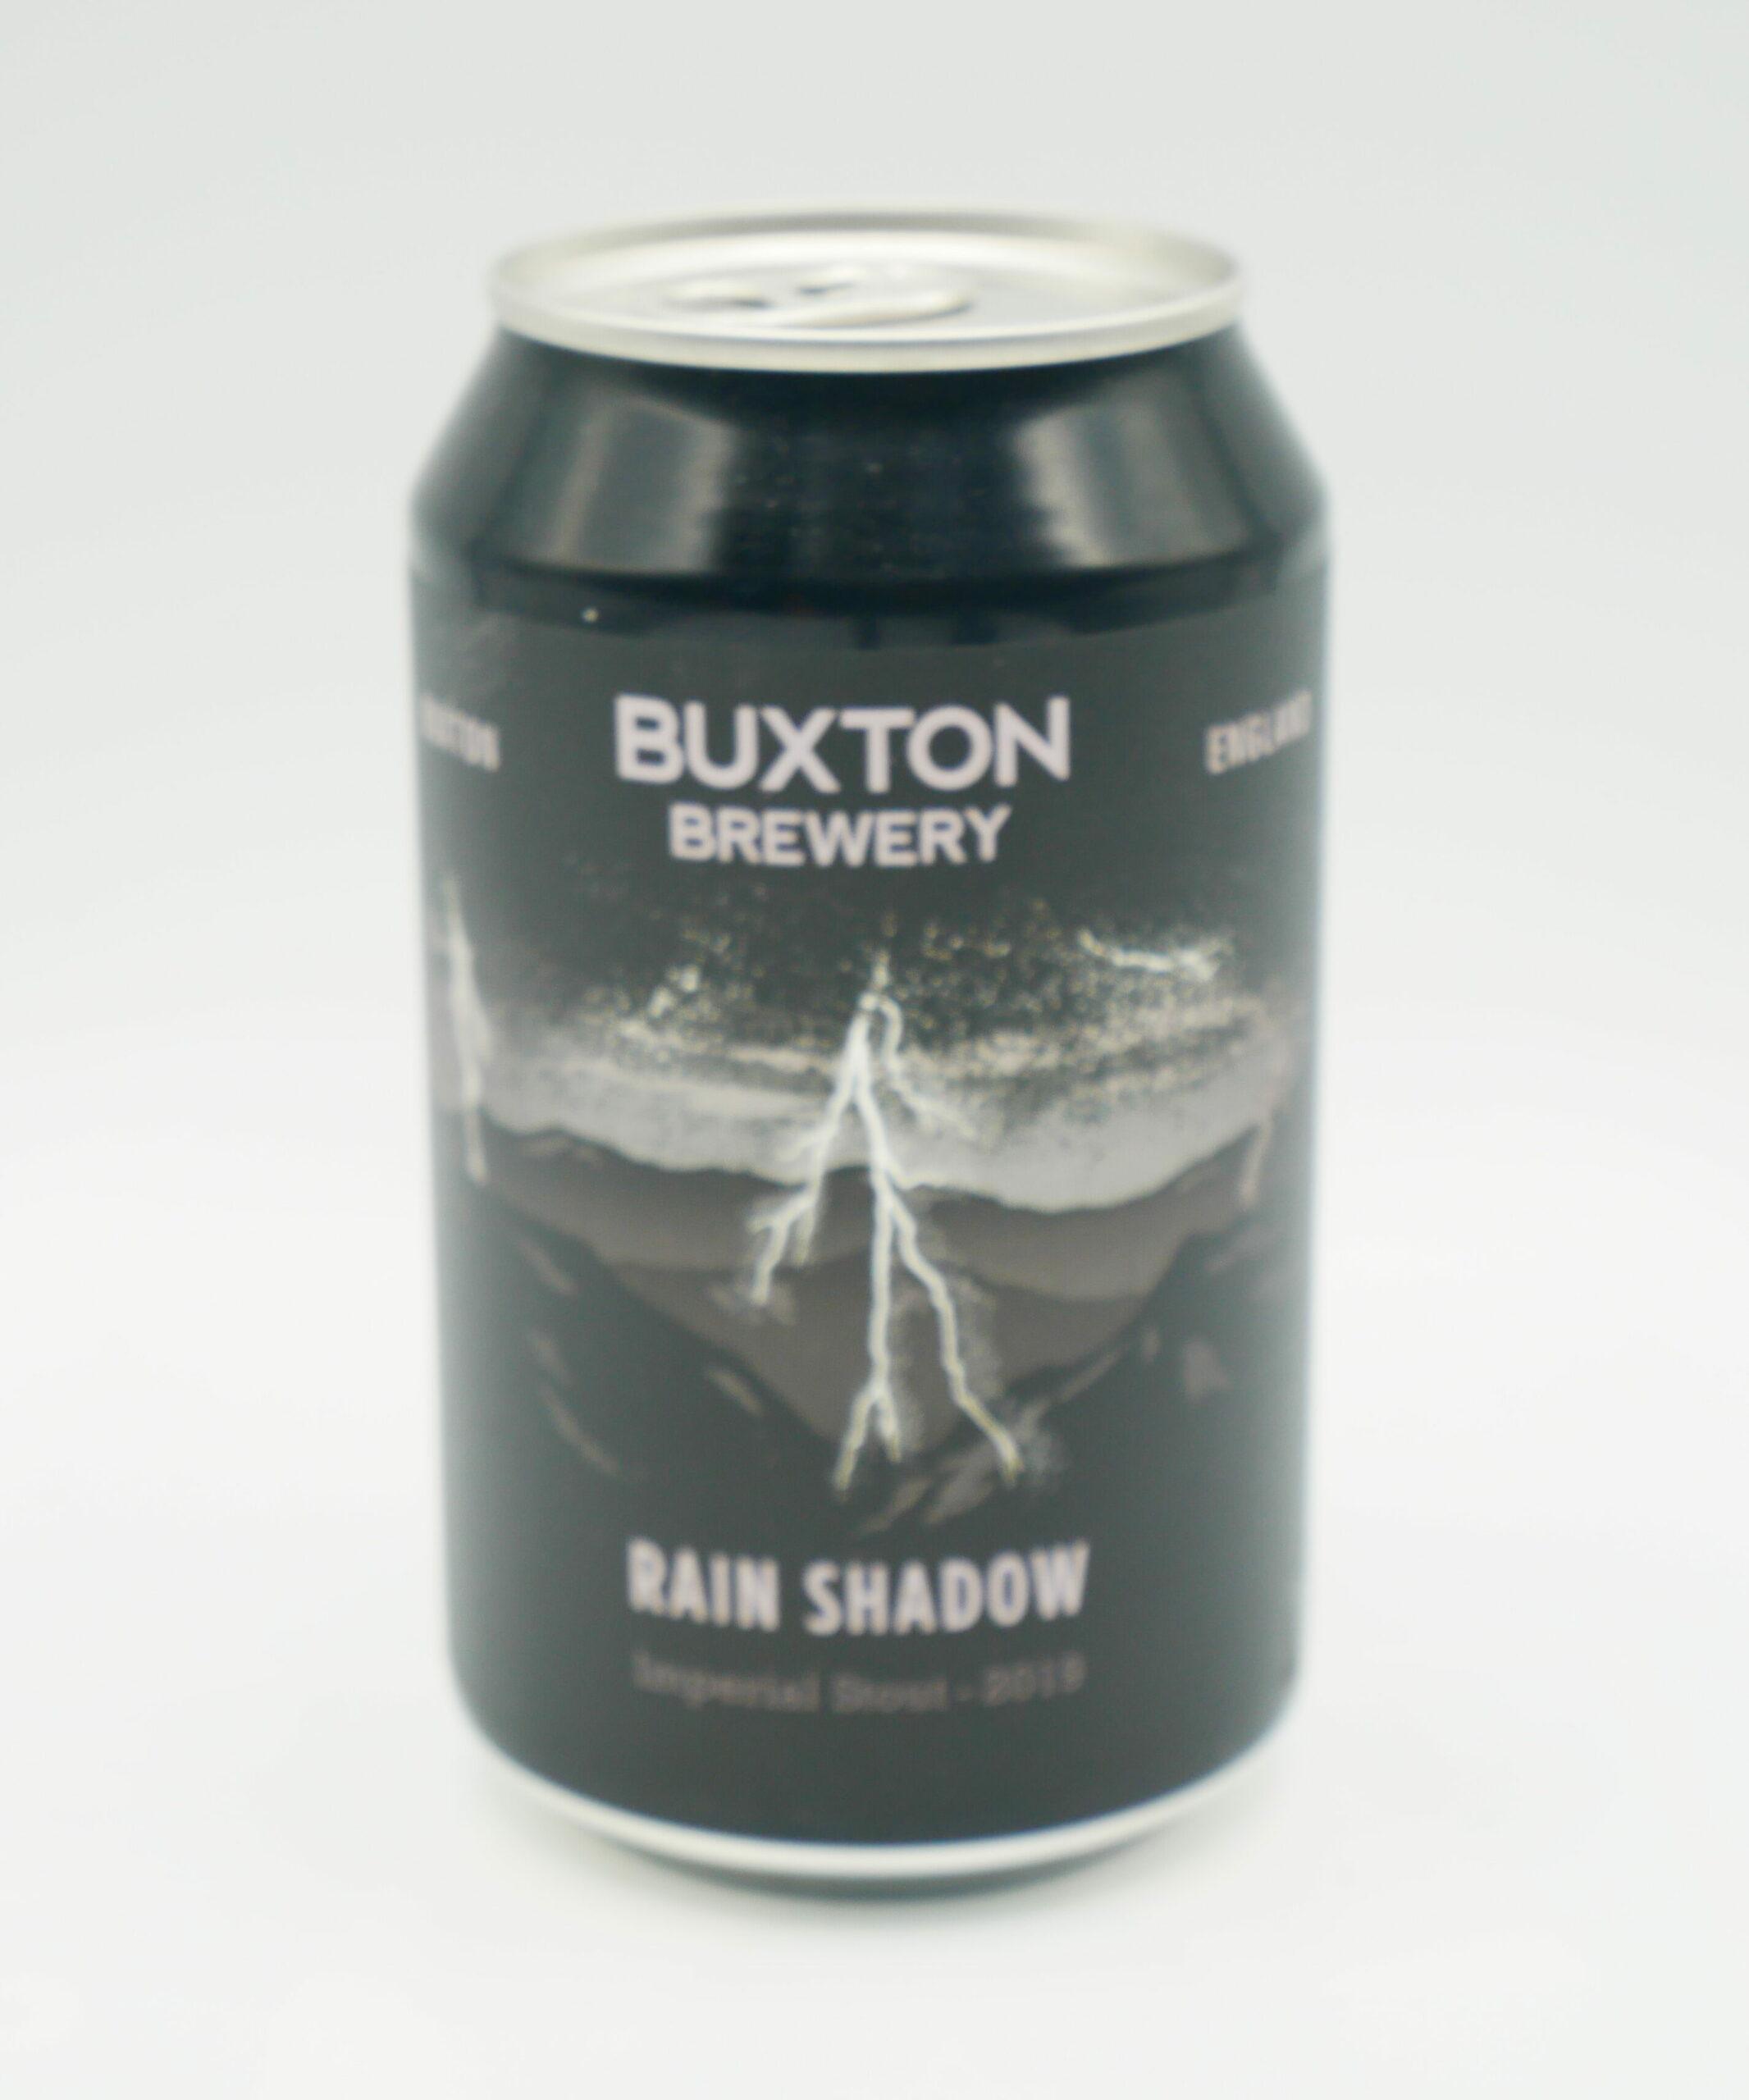 Image Rain Shadow